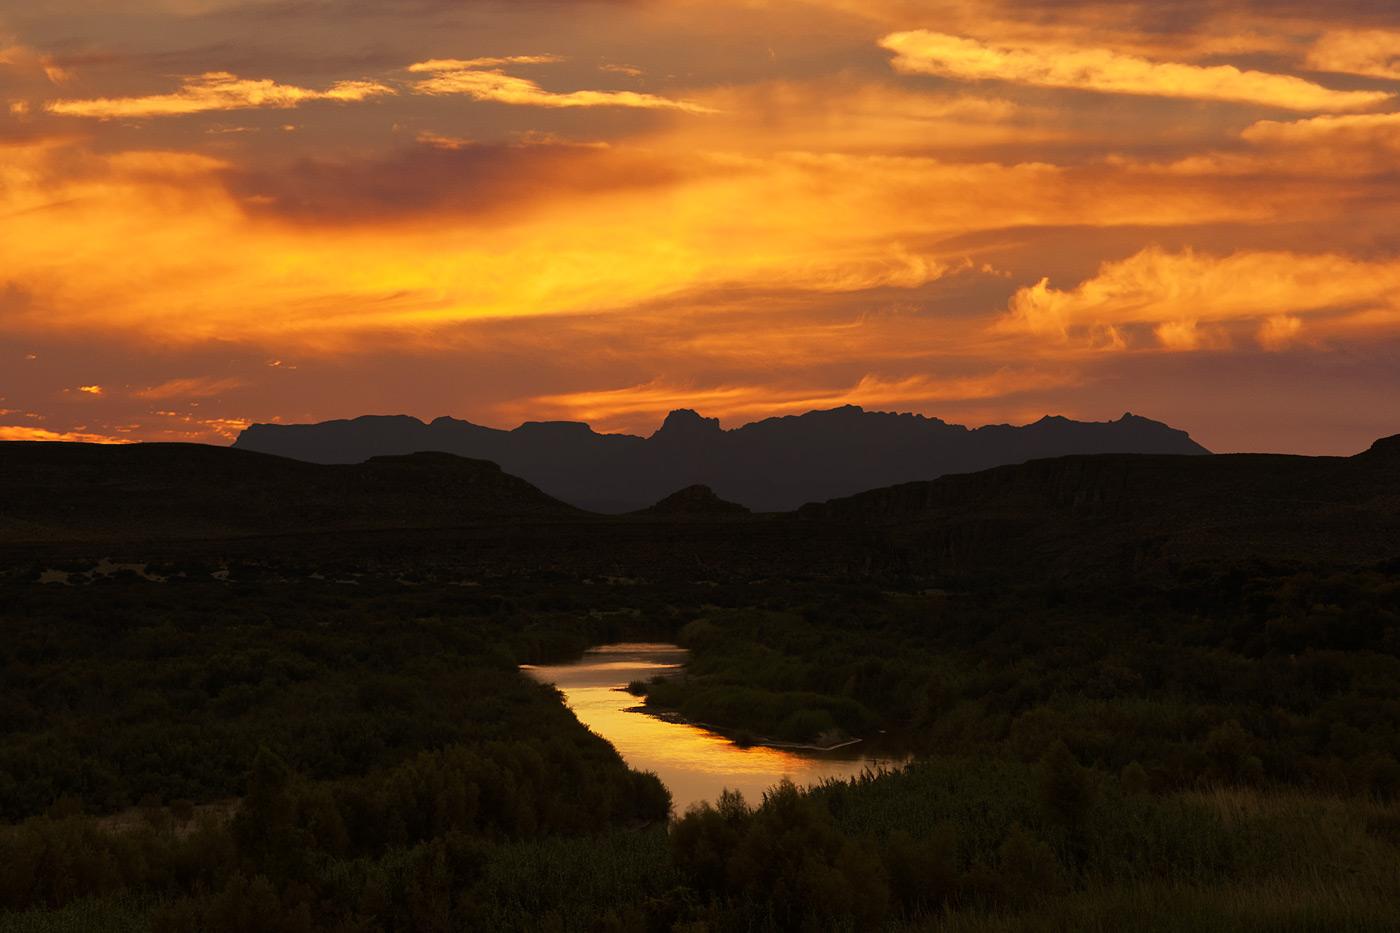 Big-Bend-National-Park-ABP-Rio-Grande-Village-Overlook_sunset.jpg